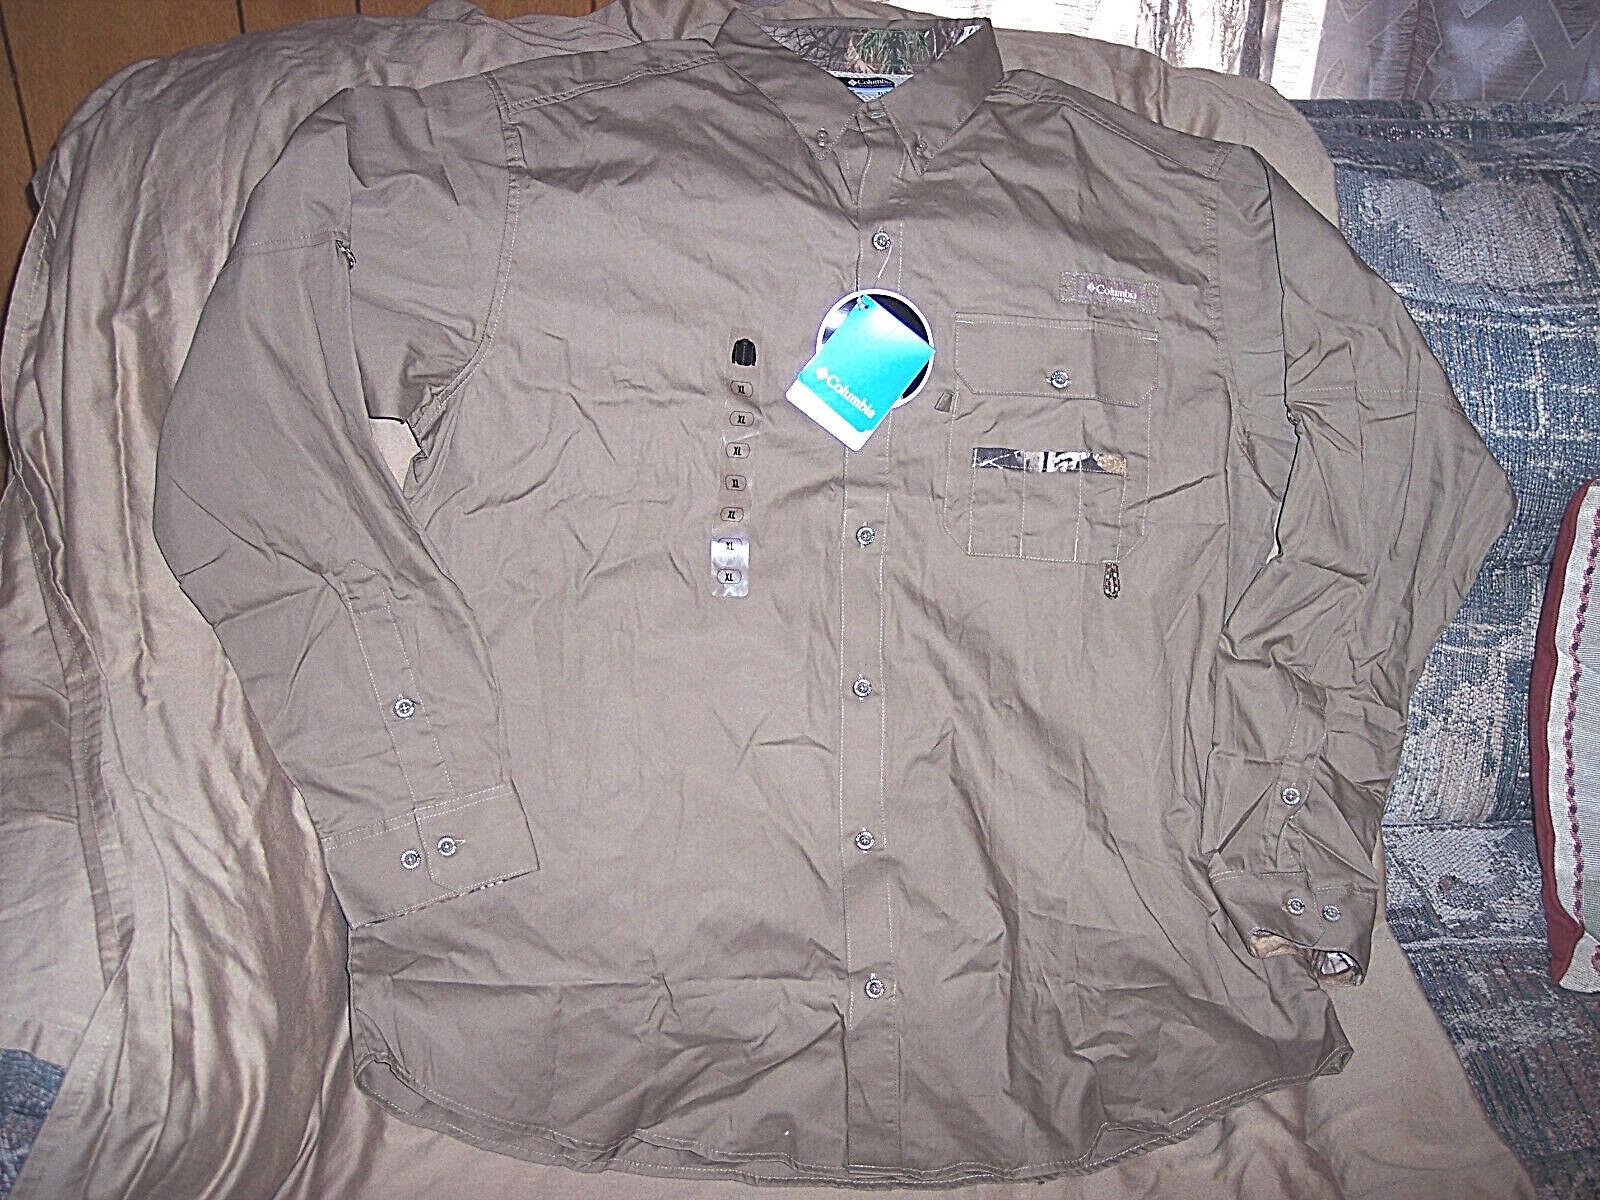 Columbia Fishing  Shirt PHG Khaki Shirt Mens 2X Shirt Dress Shirt Camo Shirt 2X  new sadie